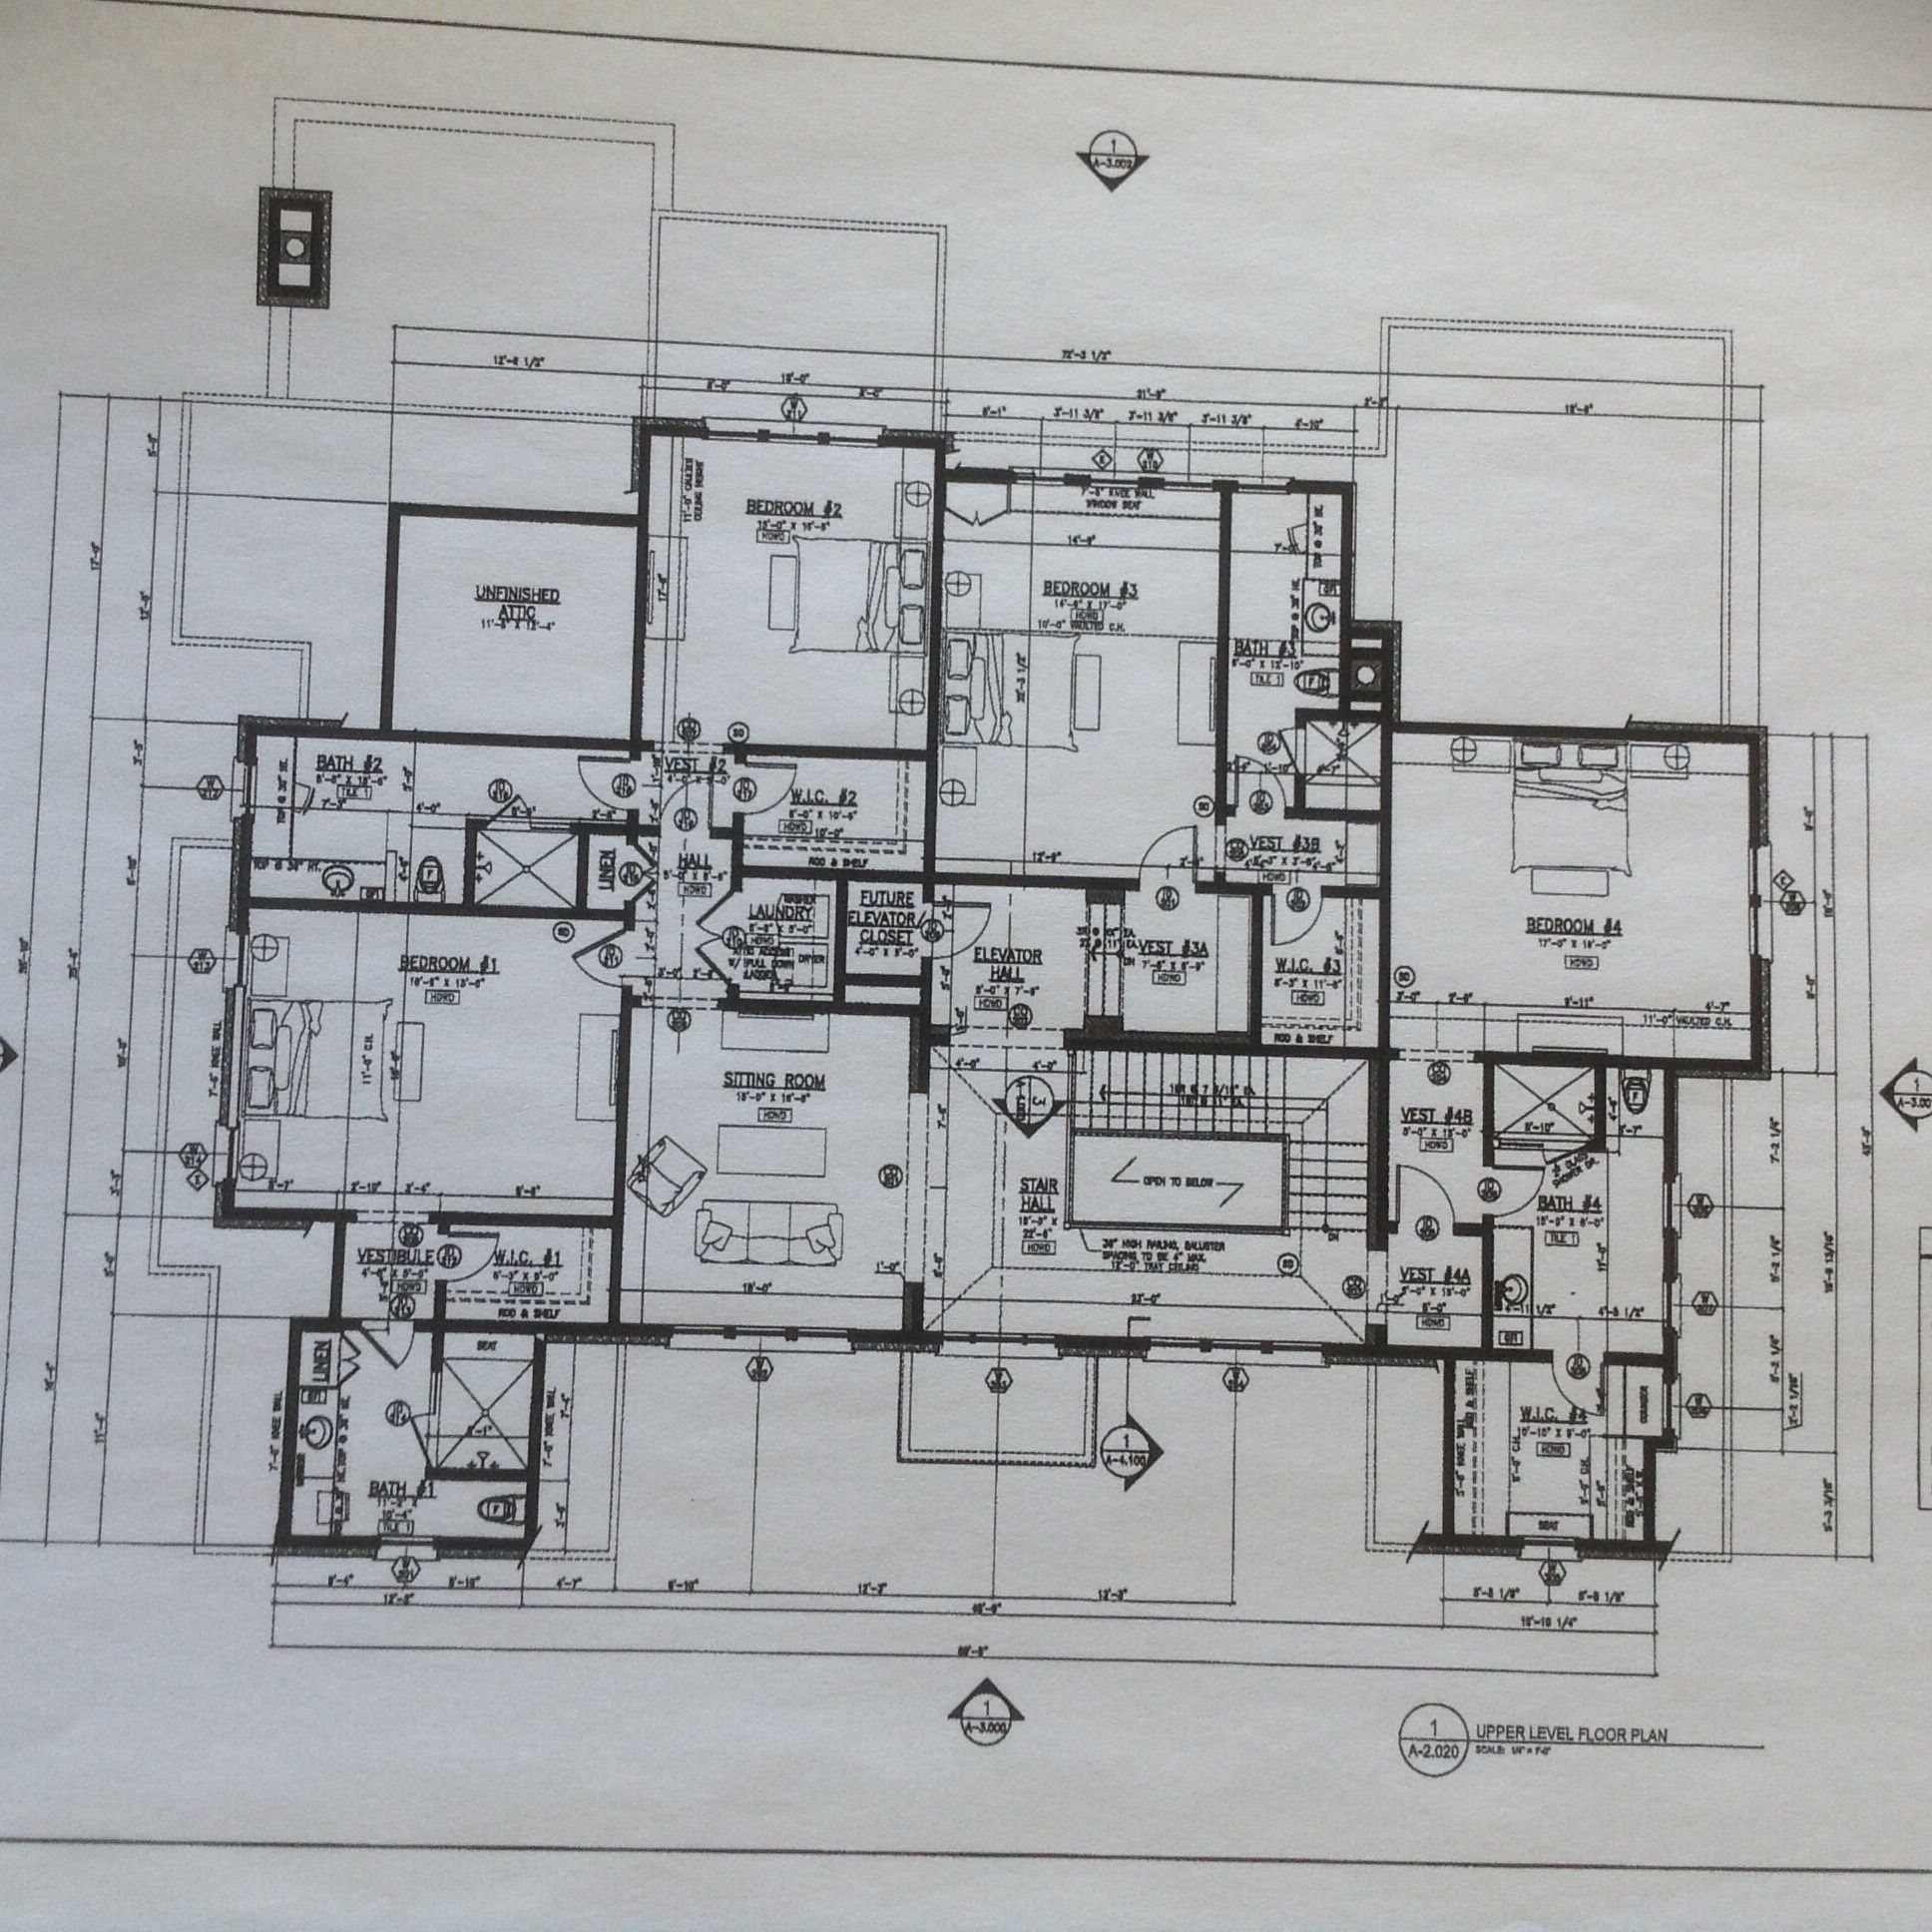 1754 Mt Paran Rd luxury floor plans Pinterest